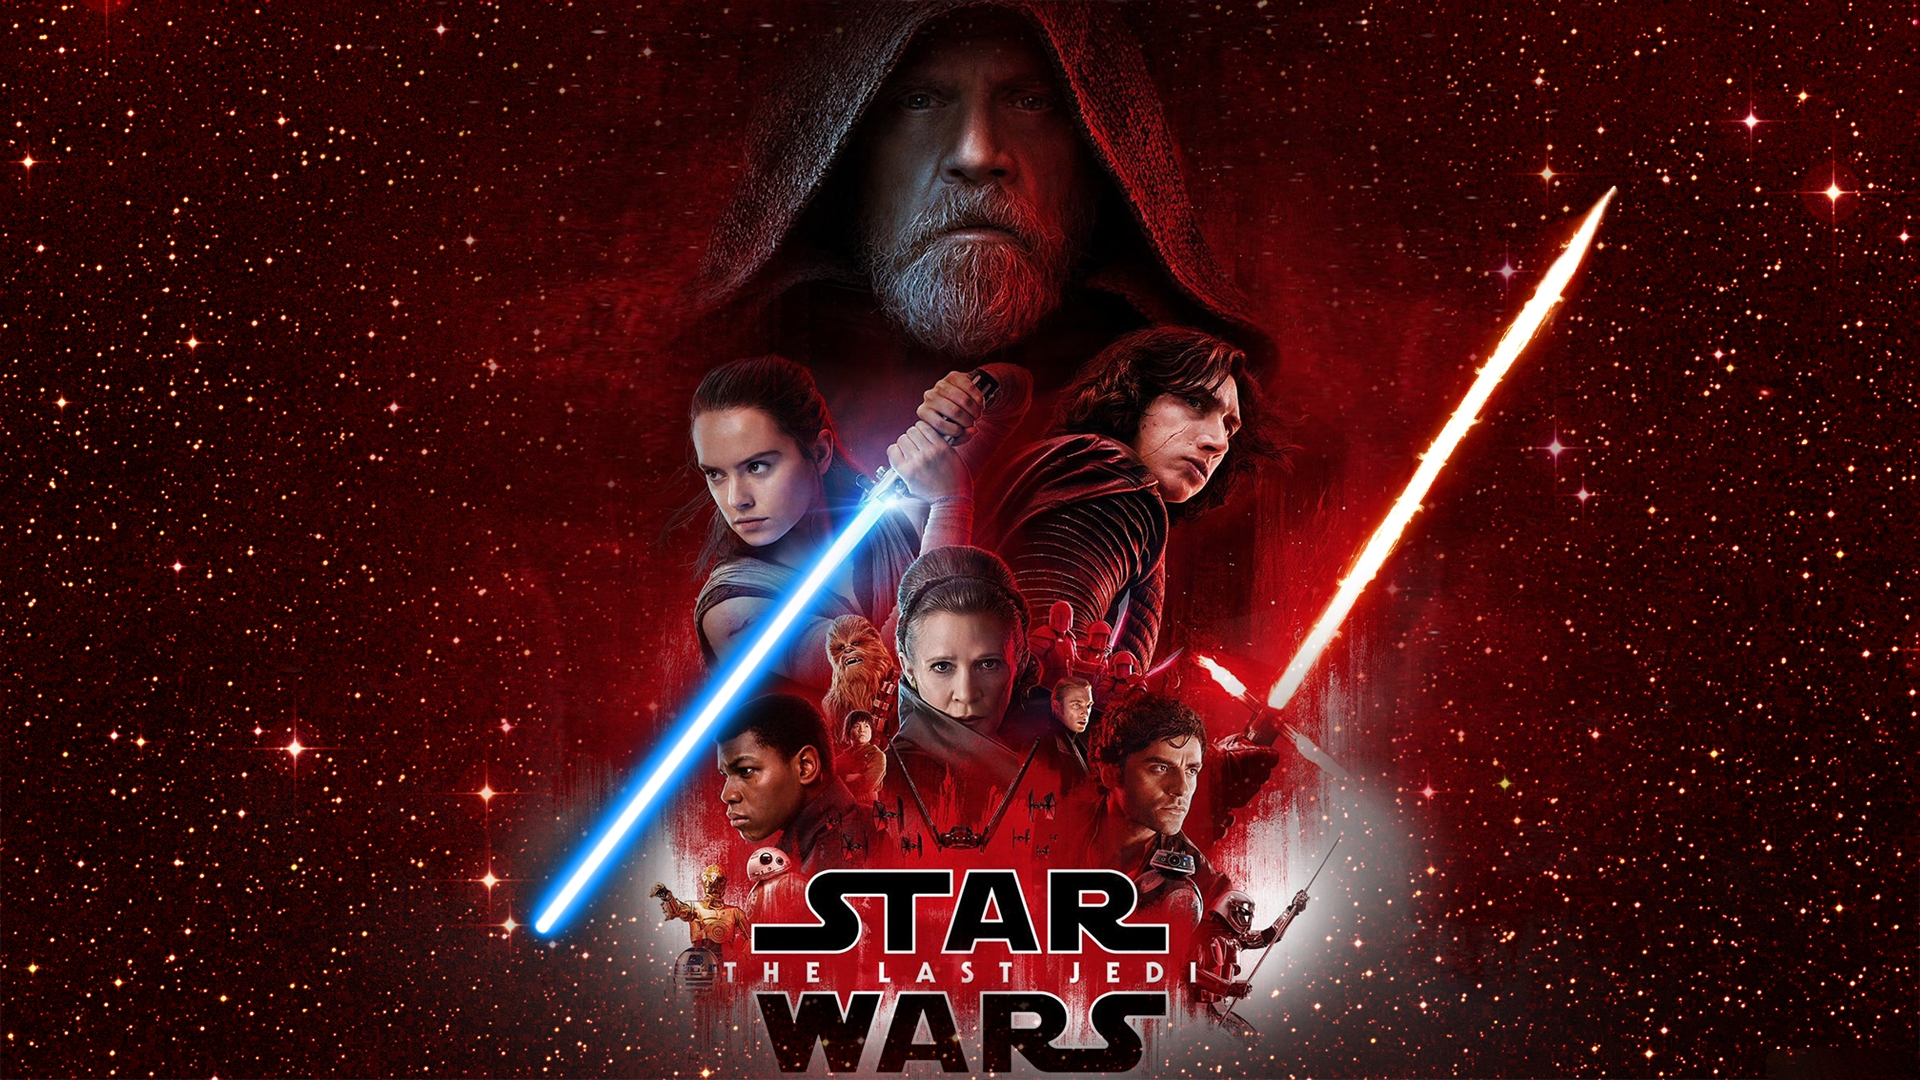 Lightsaber Iphone Wallpaper Review De La Pelicula Star Wars Los Ultimos Jedi Evilnapsis